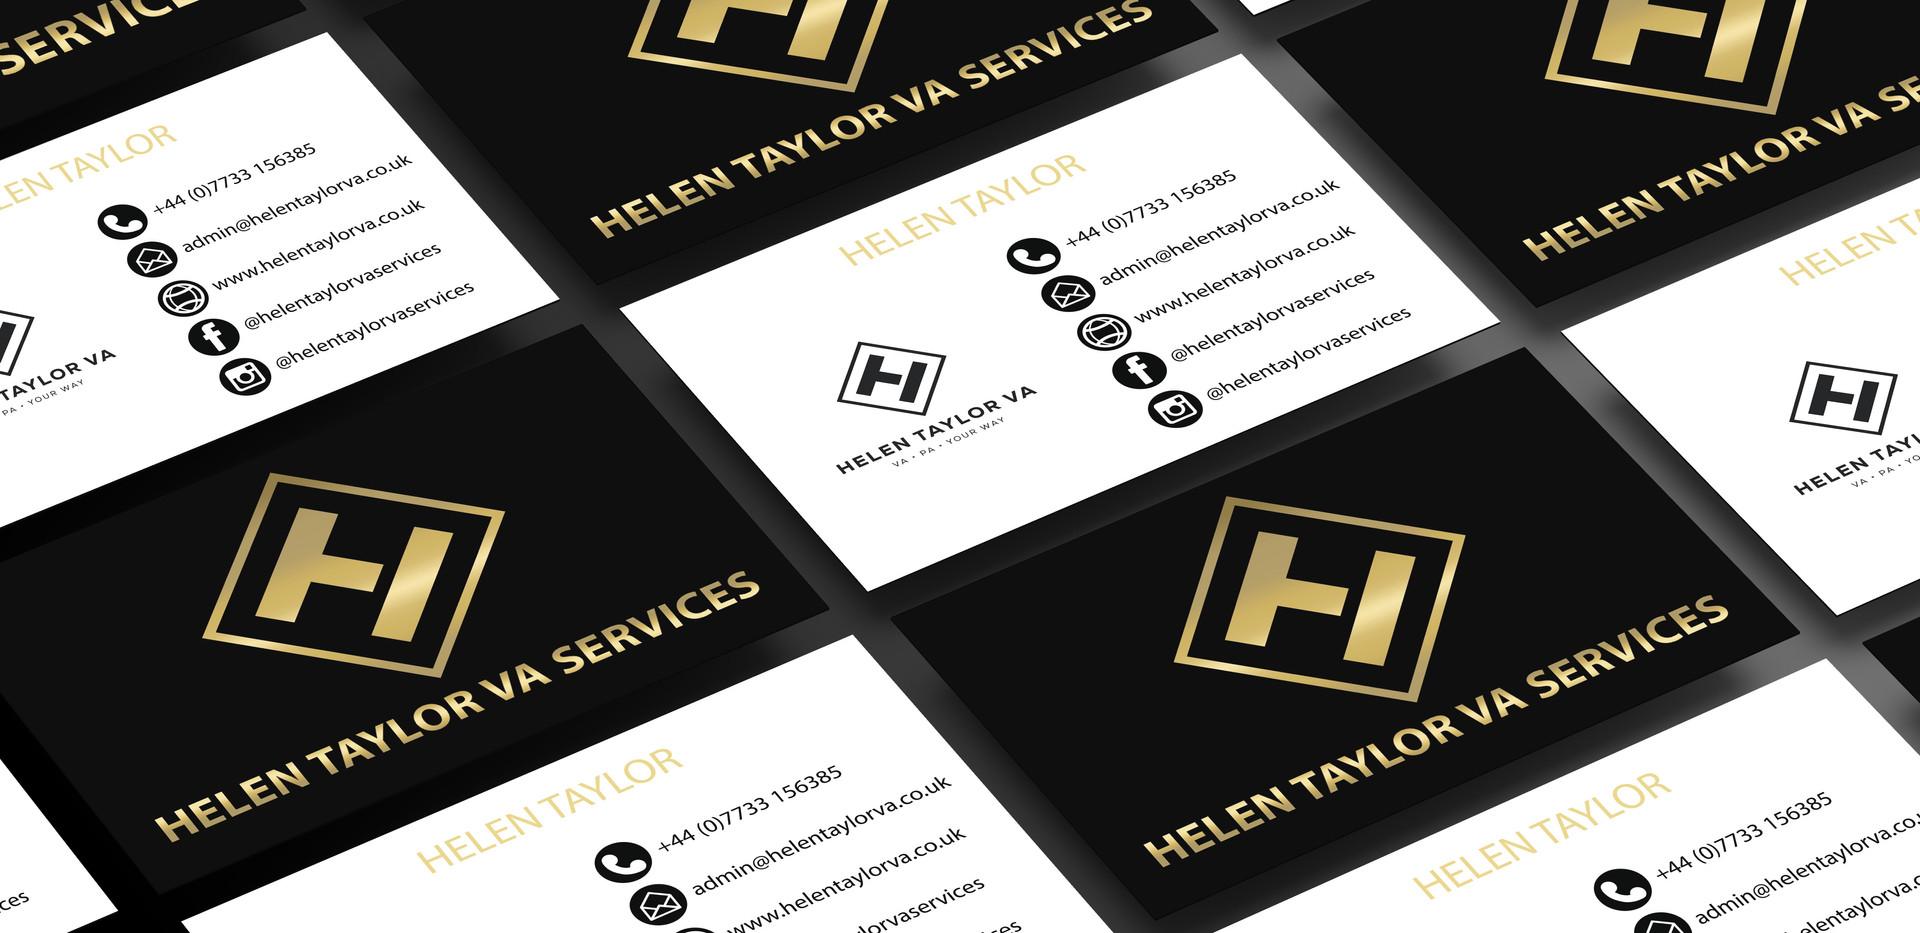 Helen Taylor VA Services Business Card design